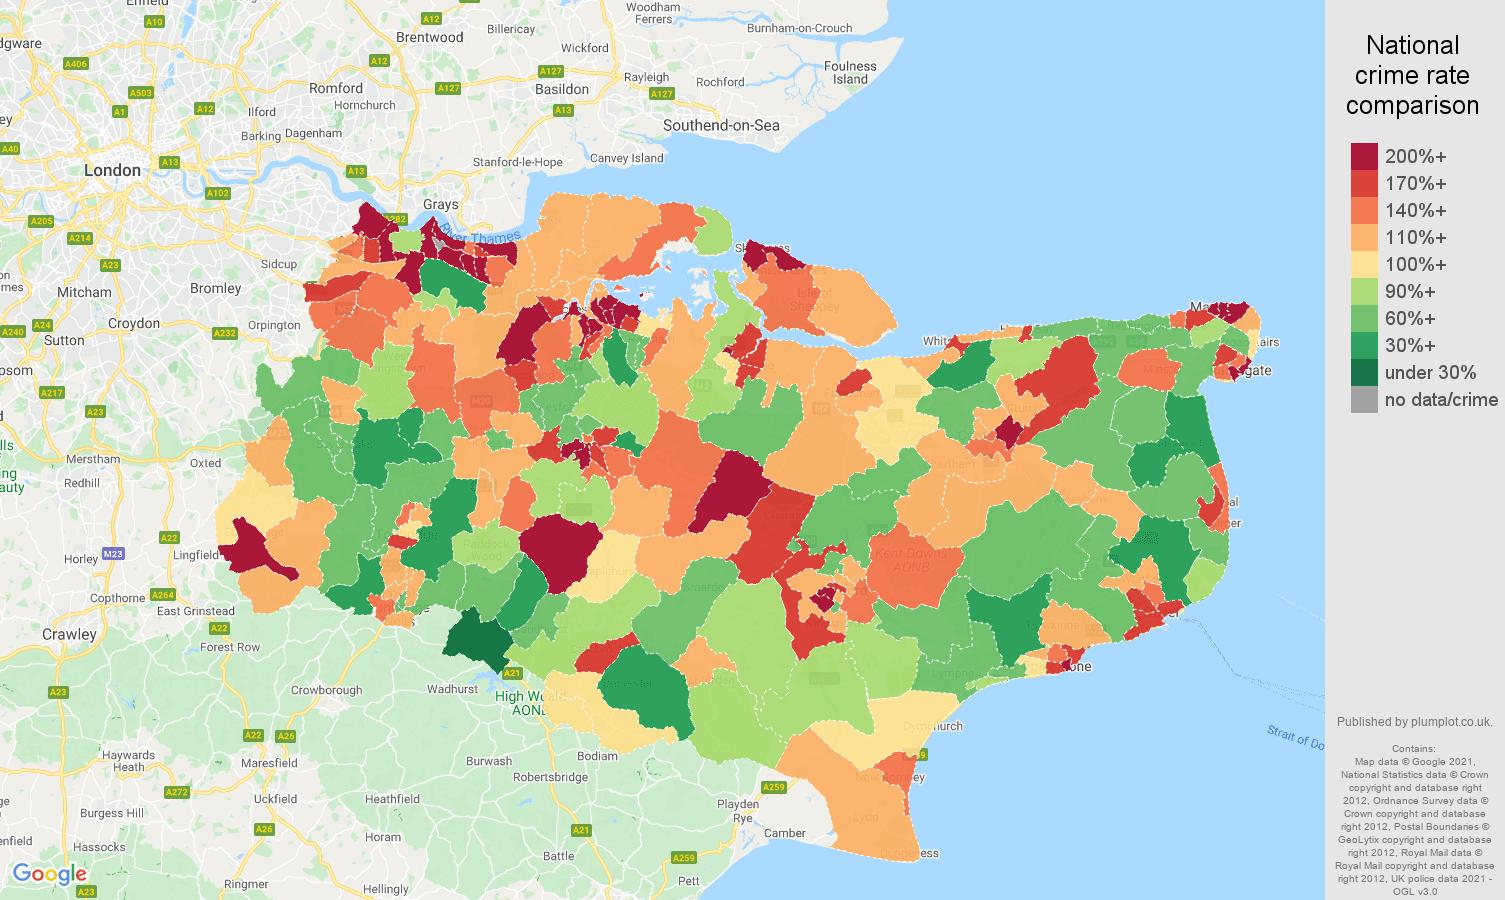 Kent criminal damage and arson crime rate comparison map